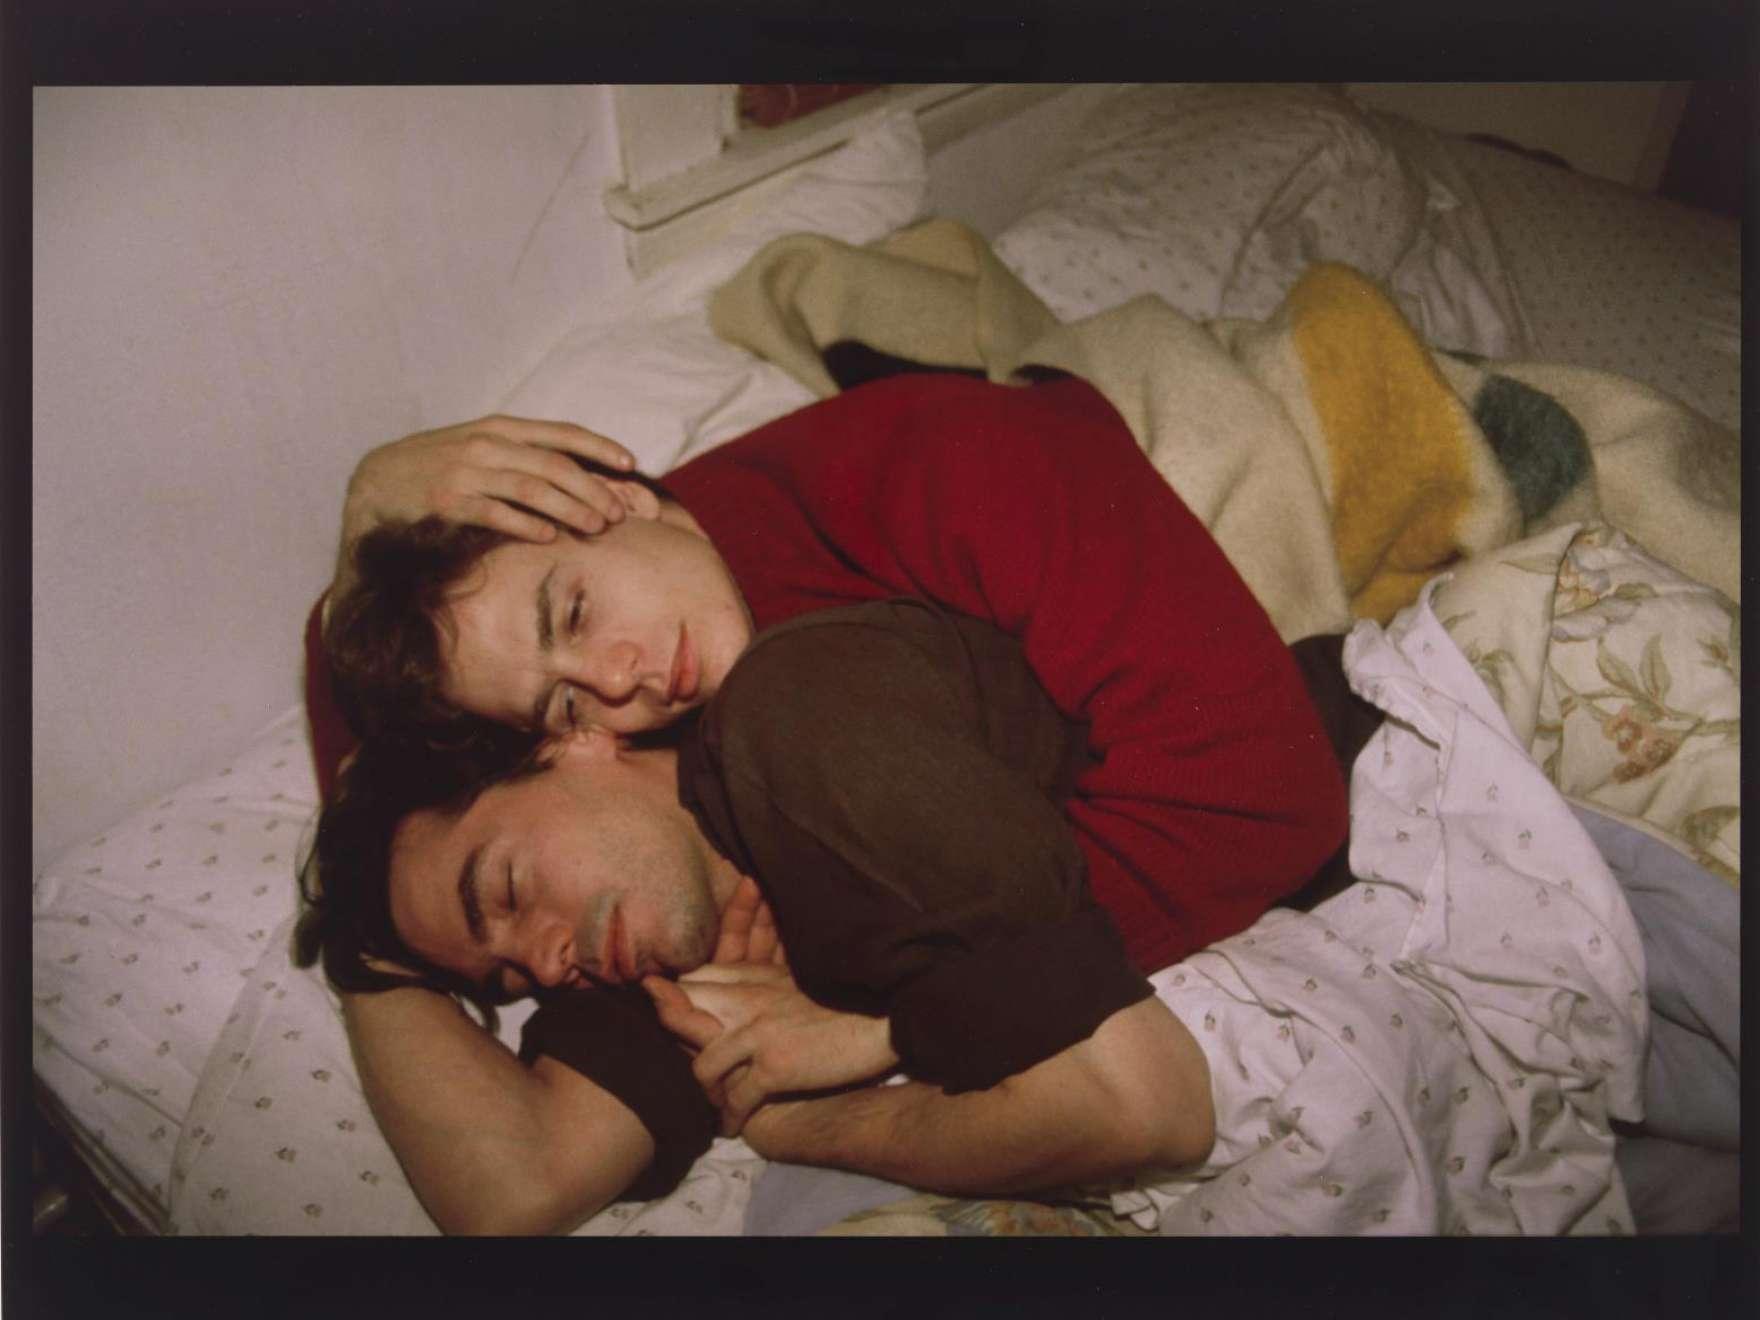 Nan Goldin's photograph, Lewis and Matt on the Bed